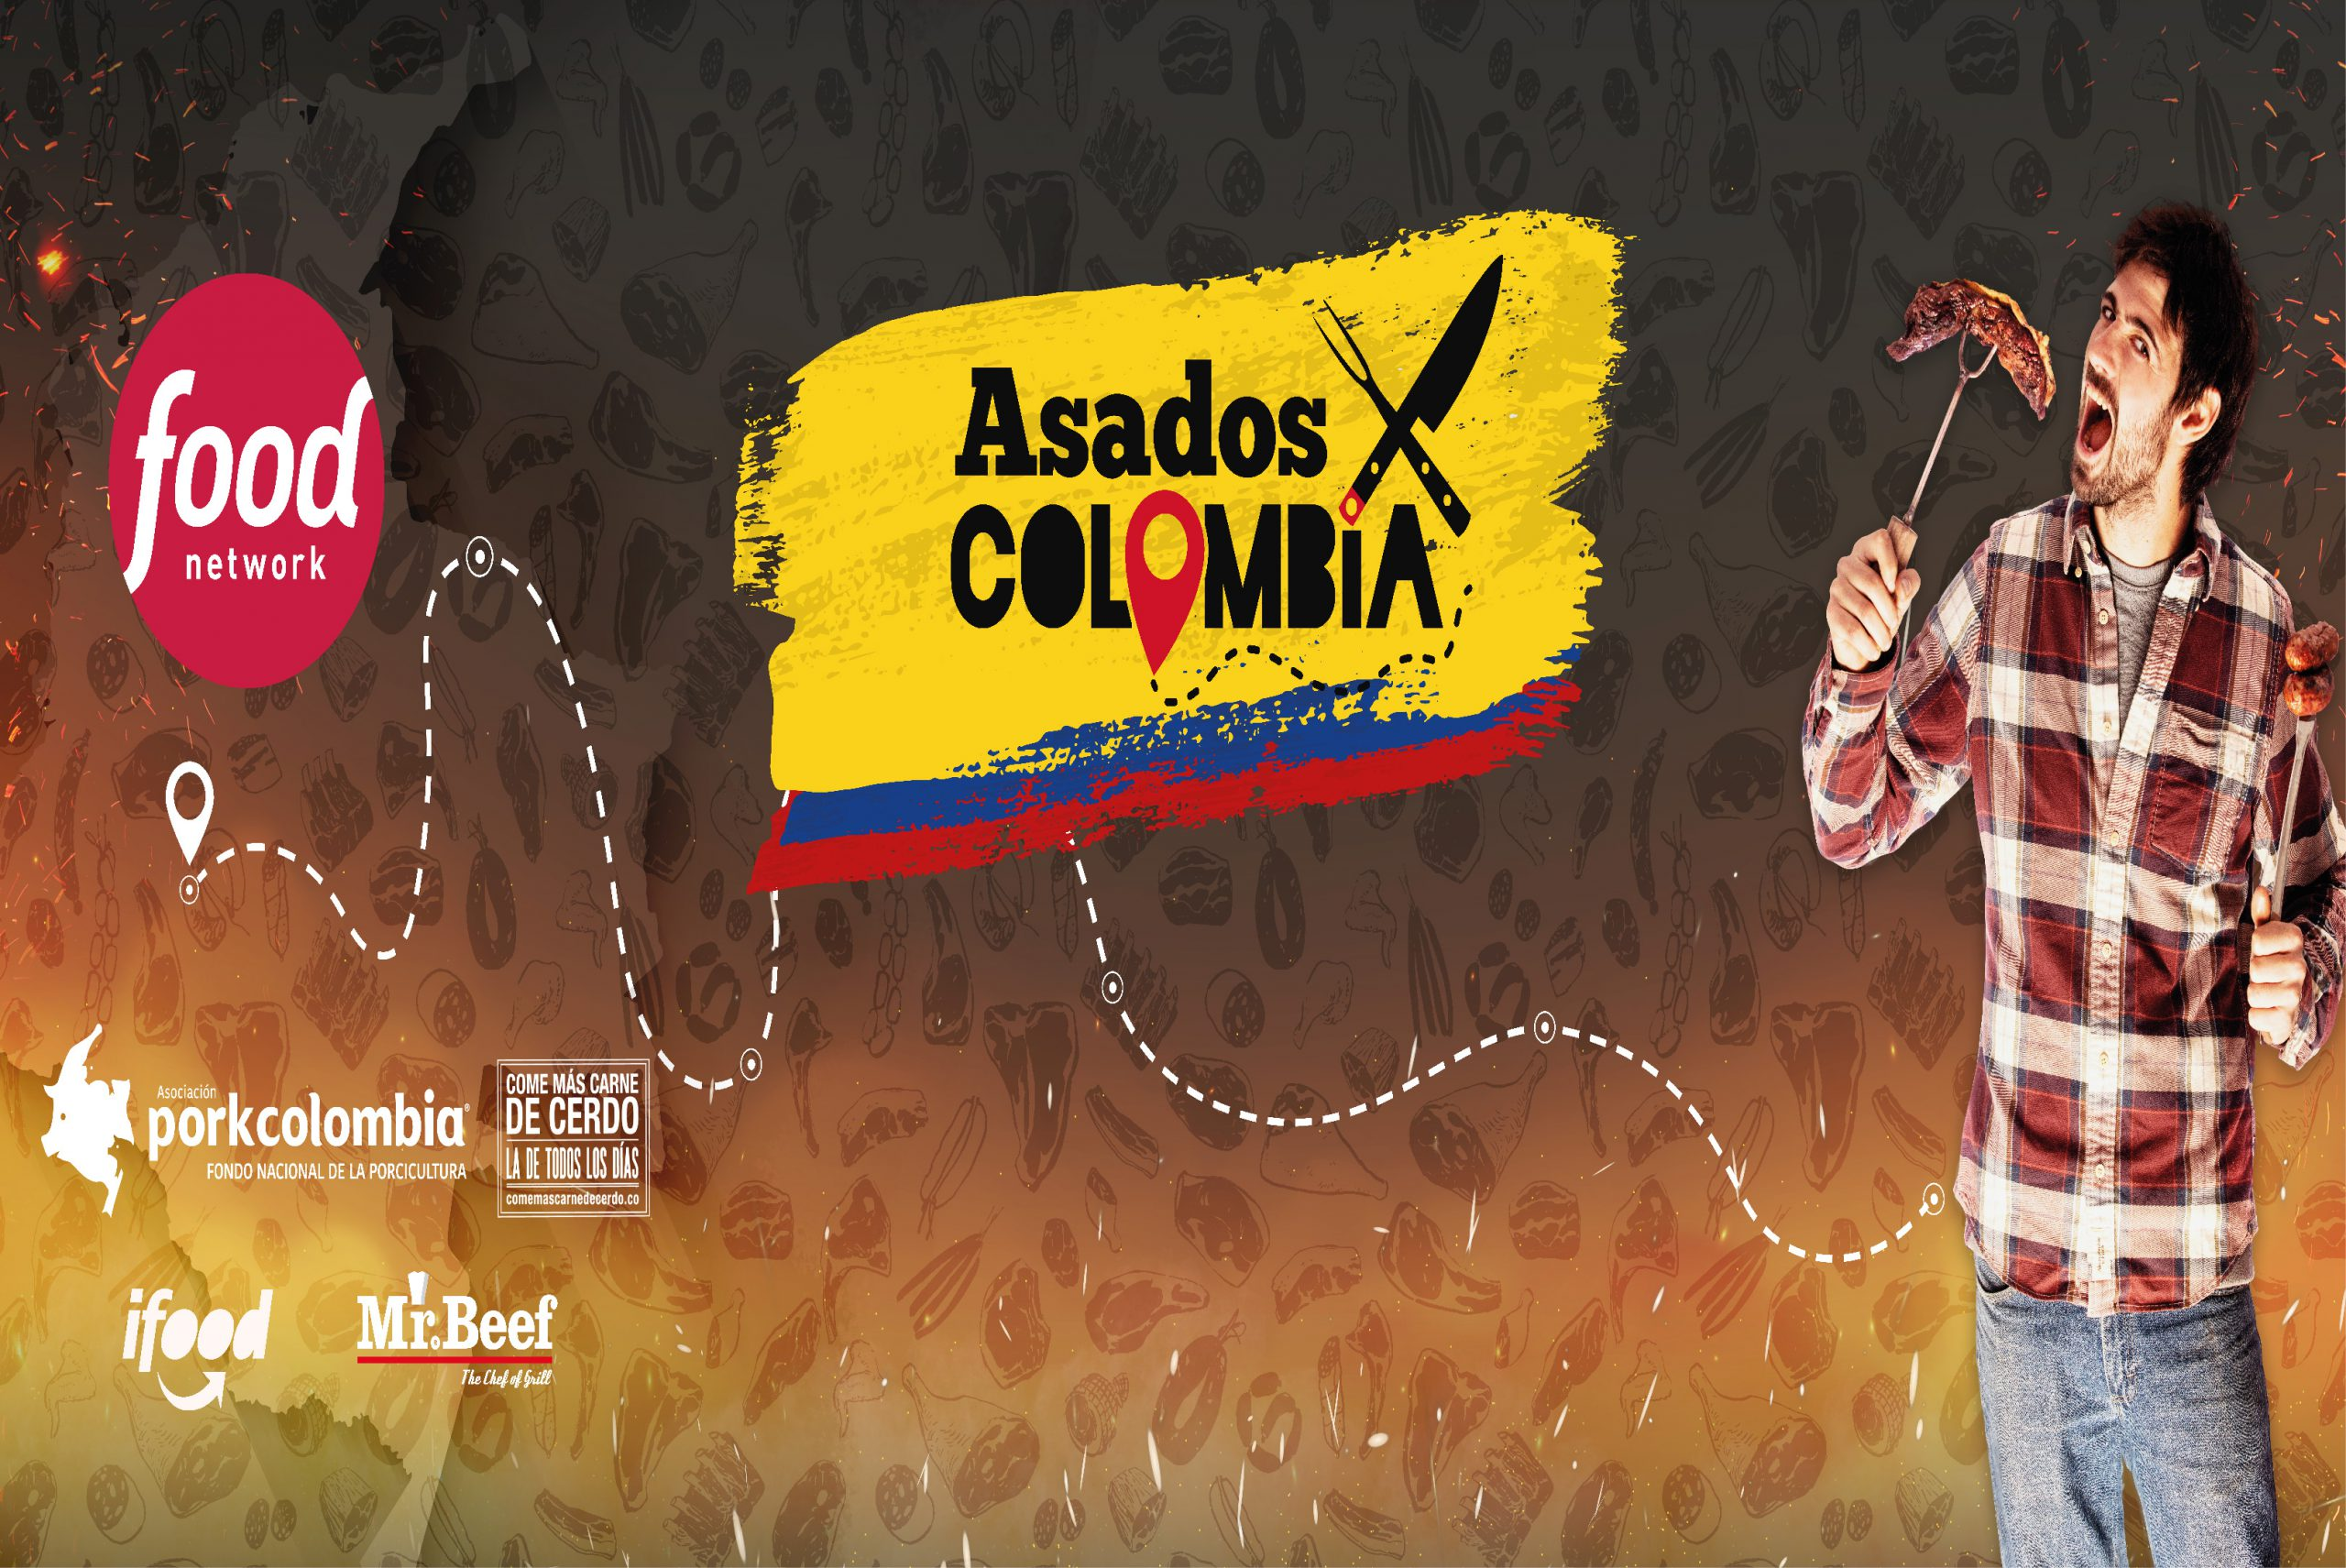 https://www.porkcolombia.co/wp-content/uploads/2021/08/asadosss_Mesa-de-trabajo-1-scaled.jpg